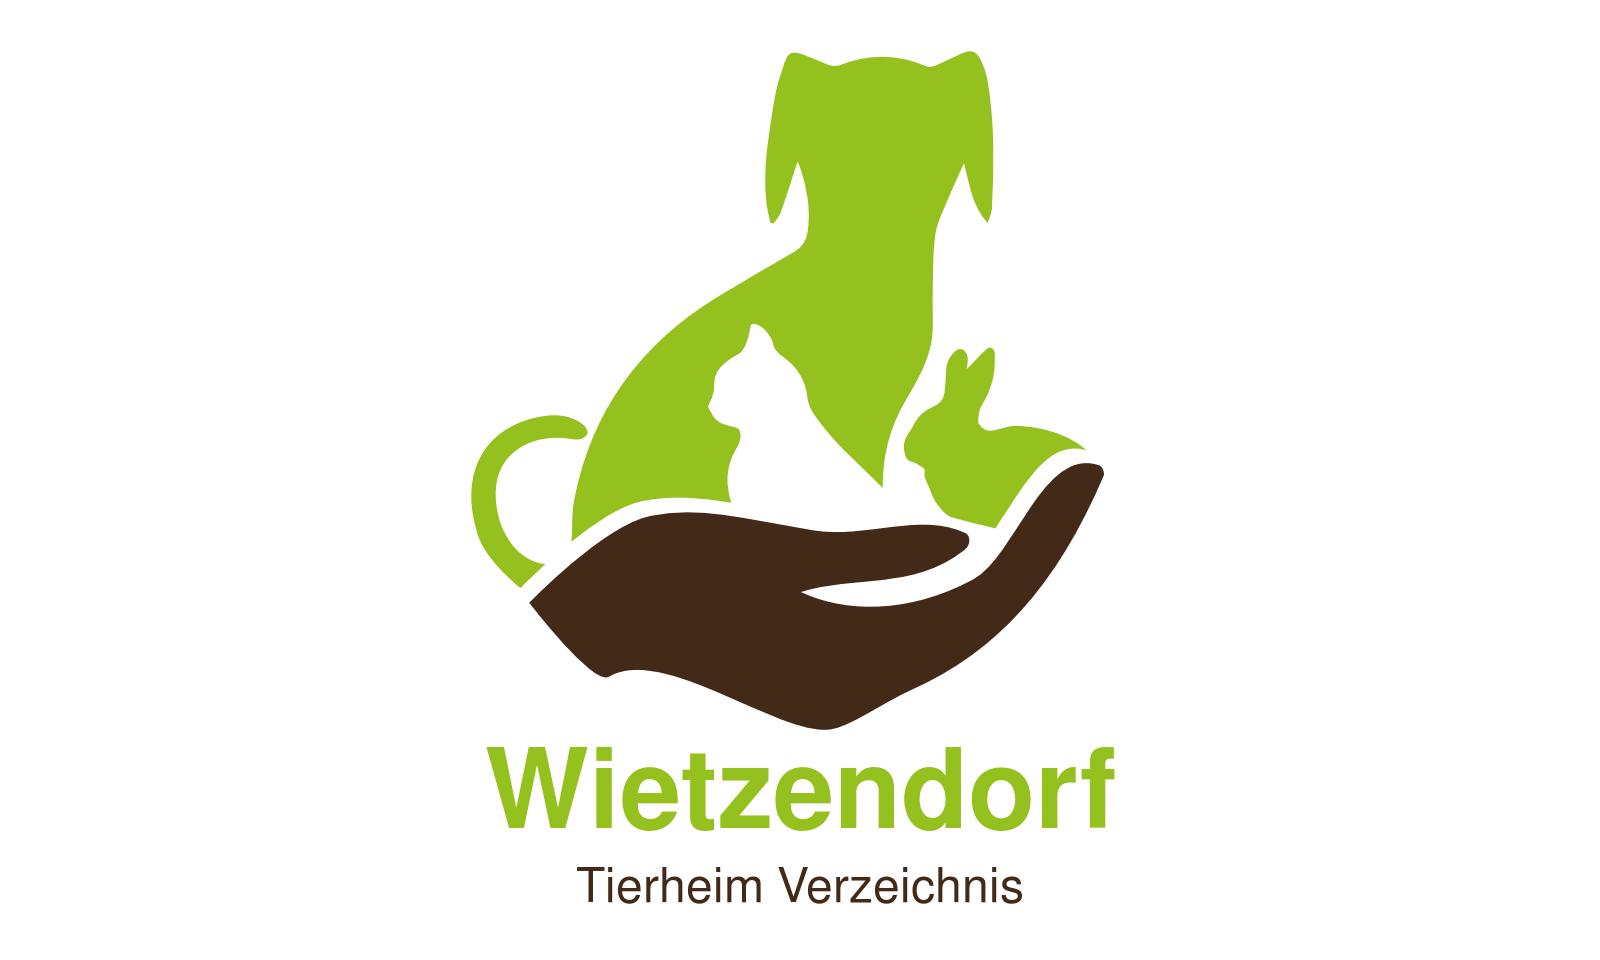 Tierheim Wietzendorf